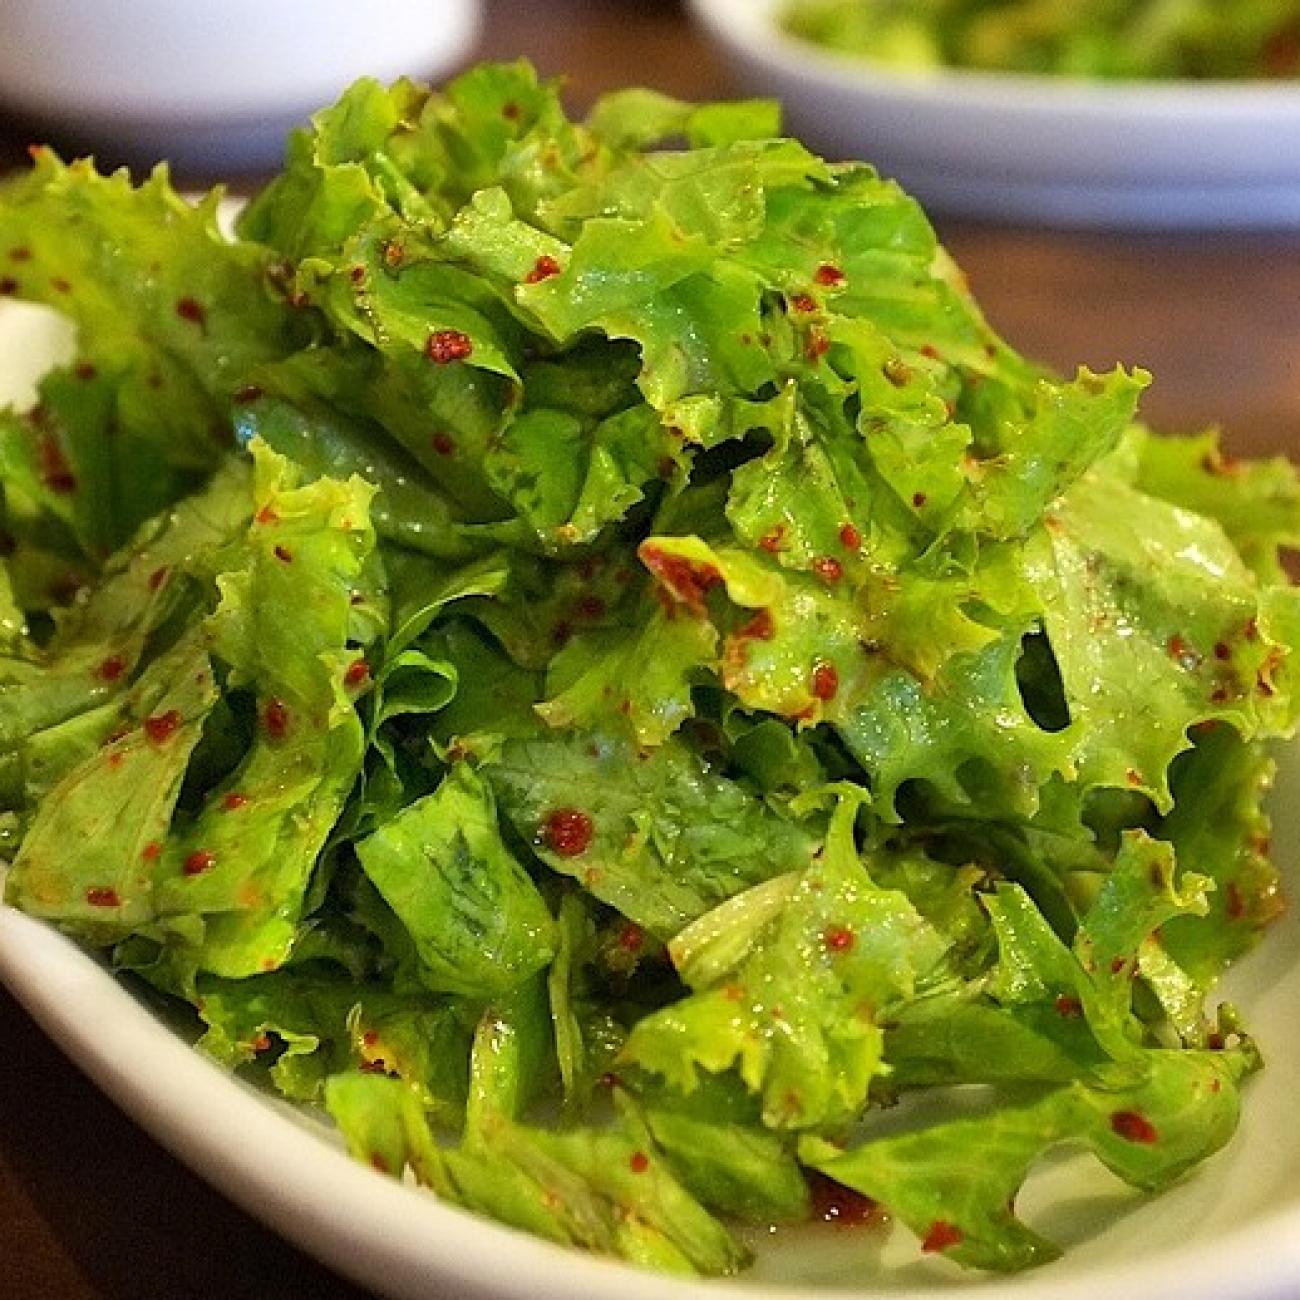 Korean Lettuce Salad (Sangchu Geotjeori 상추겉절이)